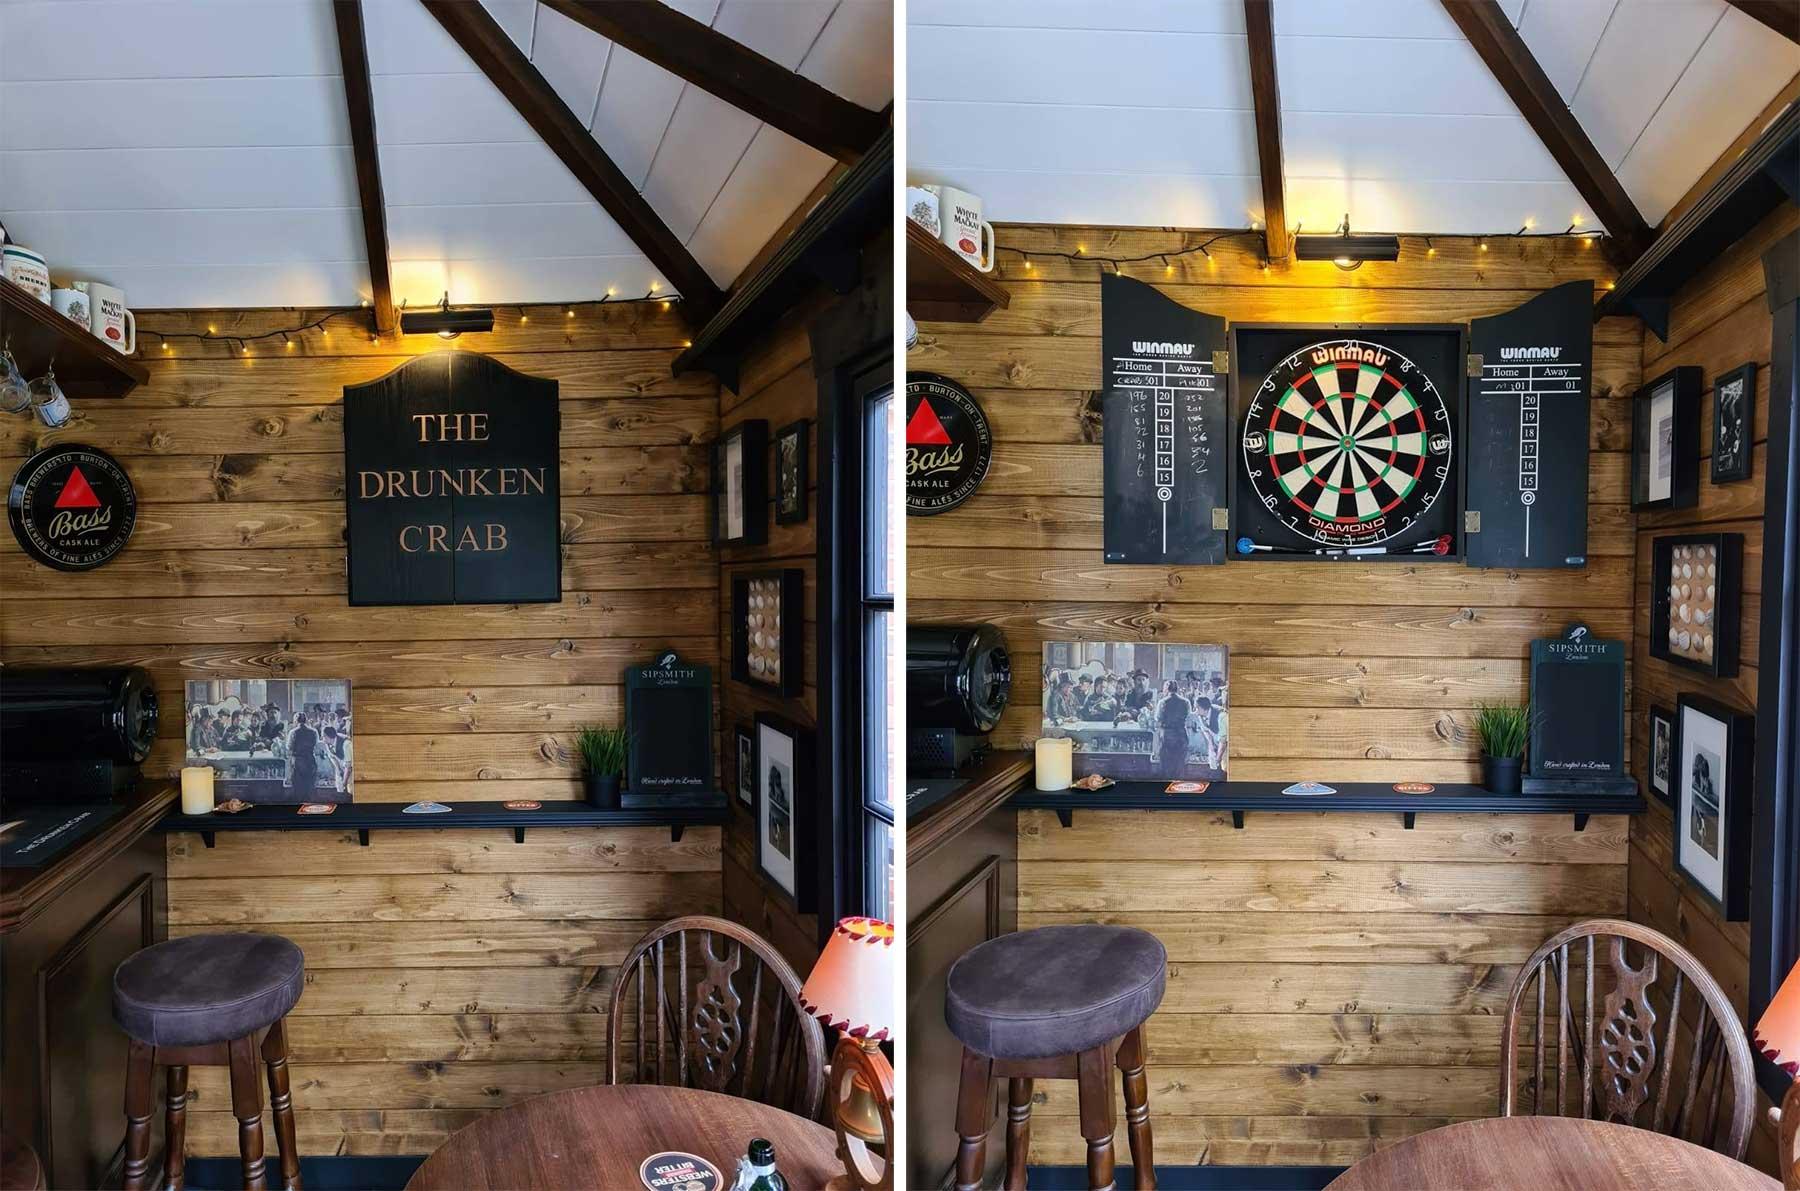 DIY-Mini-Pub im eigenen Garten gebaut the-drunken-crab-privater-pub_05